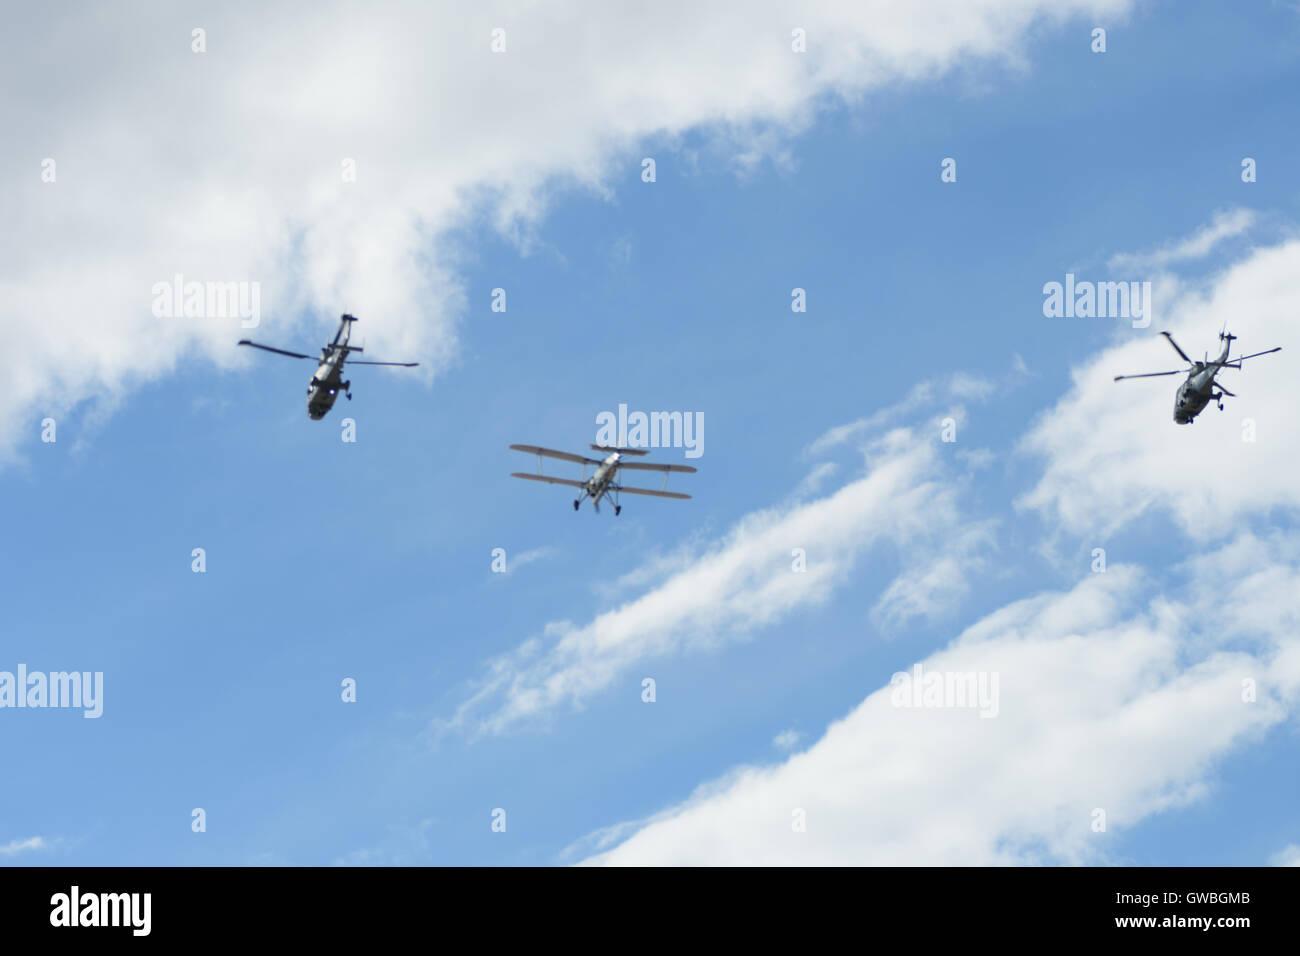 southport airshow fairy swordfish bi-plane plane aircraft - Stock Image